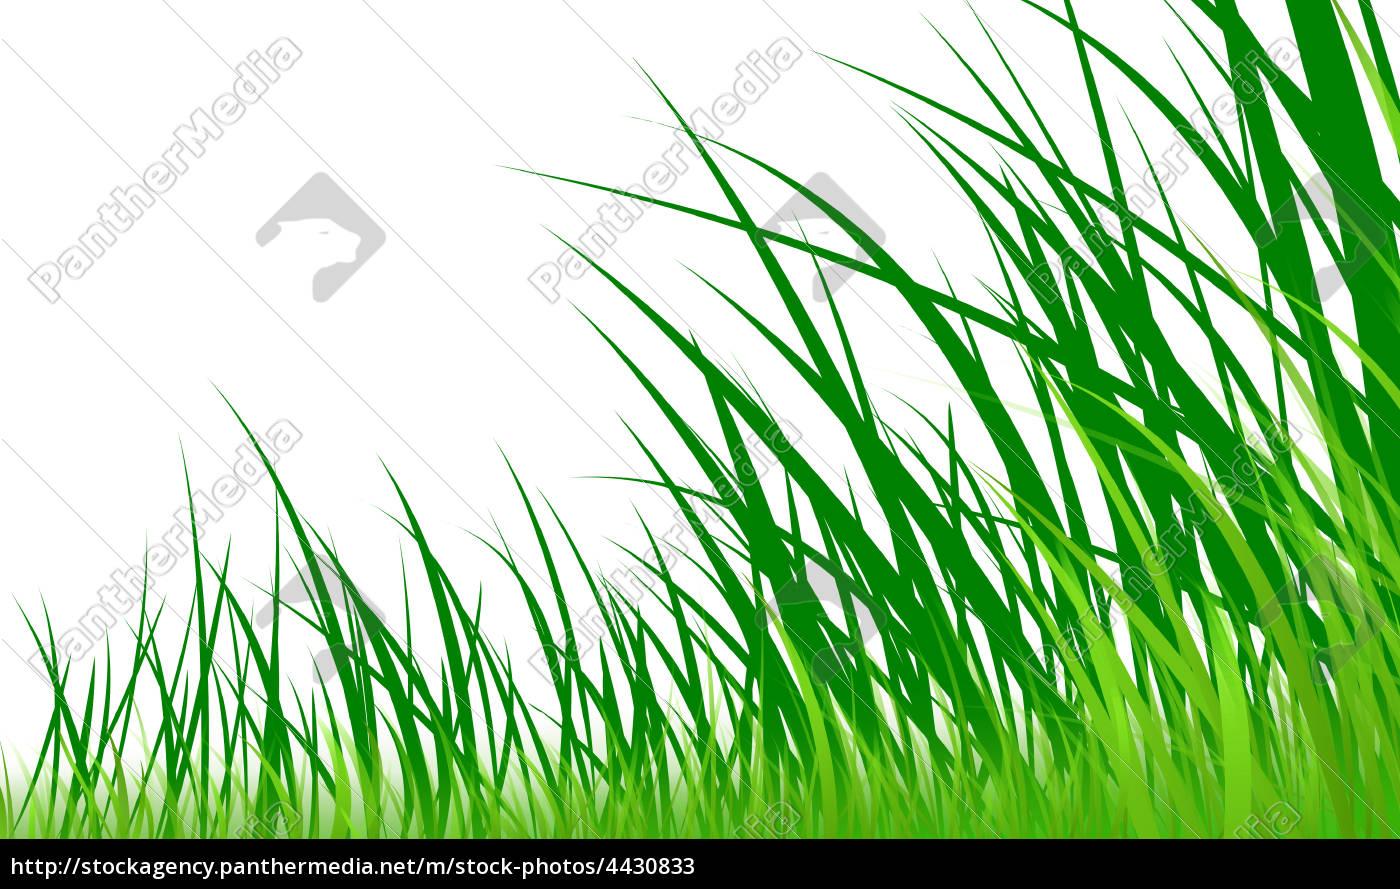 gras-grafik-wiese - Lizenzfreies Bild - #4430833